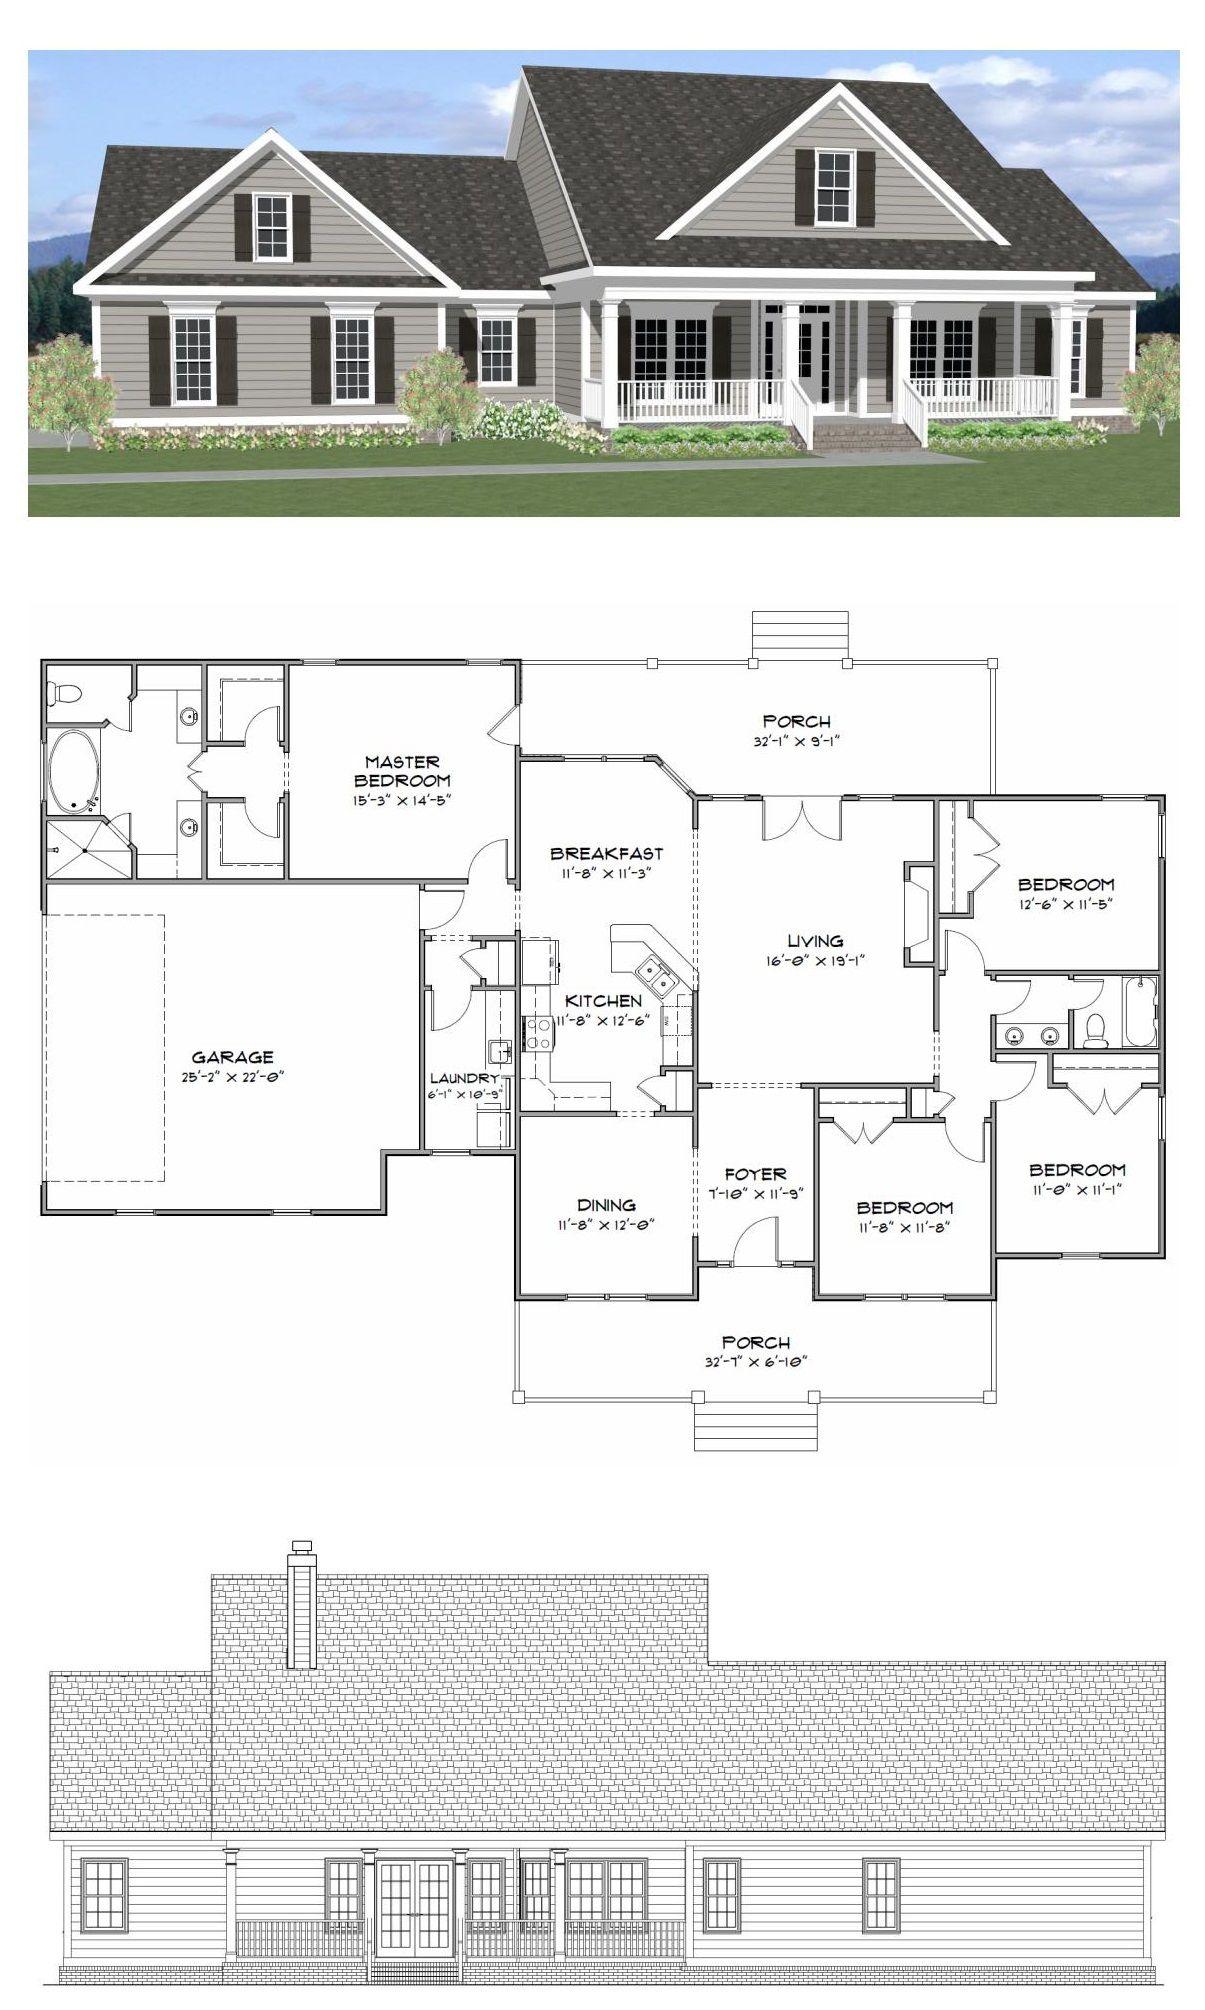 most popular ways to master bedroom design layout floor plans bathroom in pinterest also rh ar